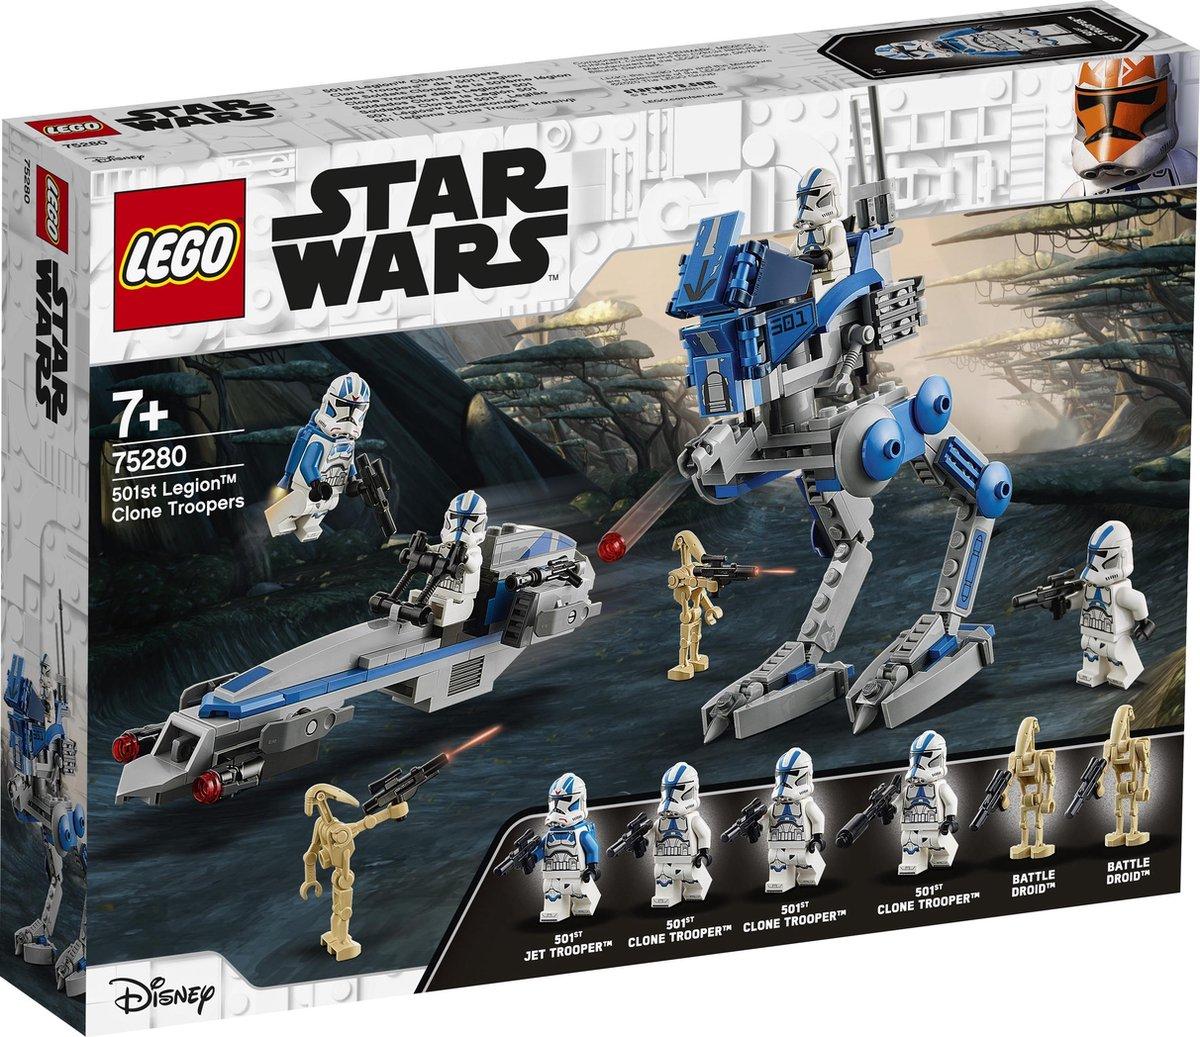 LEGO Star Wars 501st Legion Clone Troopers - 75280